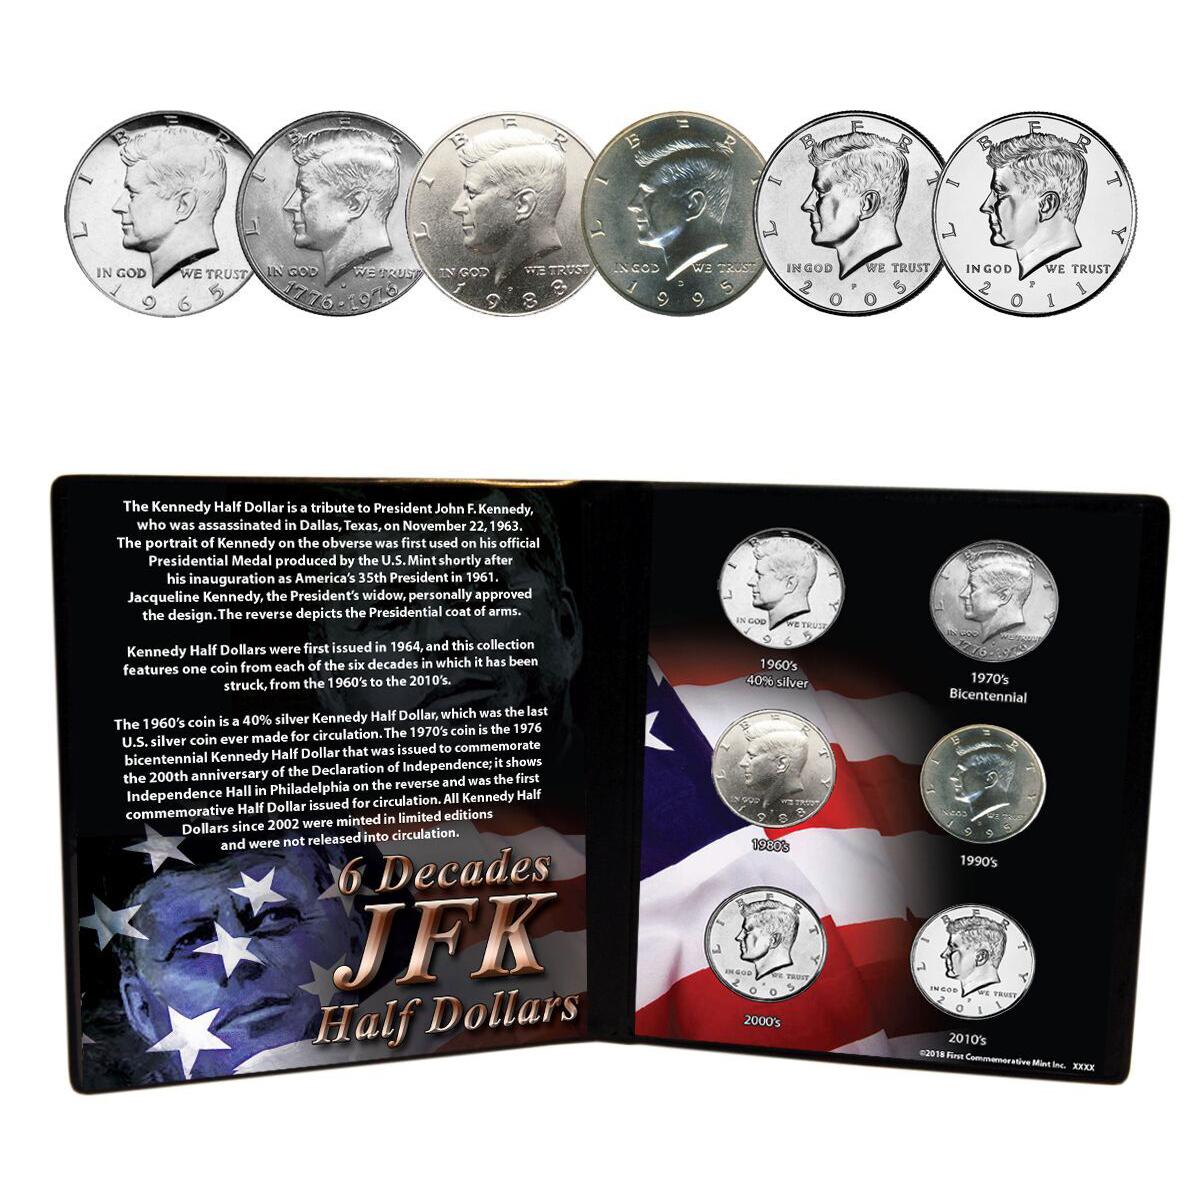 Six Decades of JFK Half Dollars